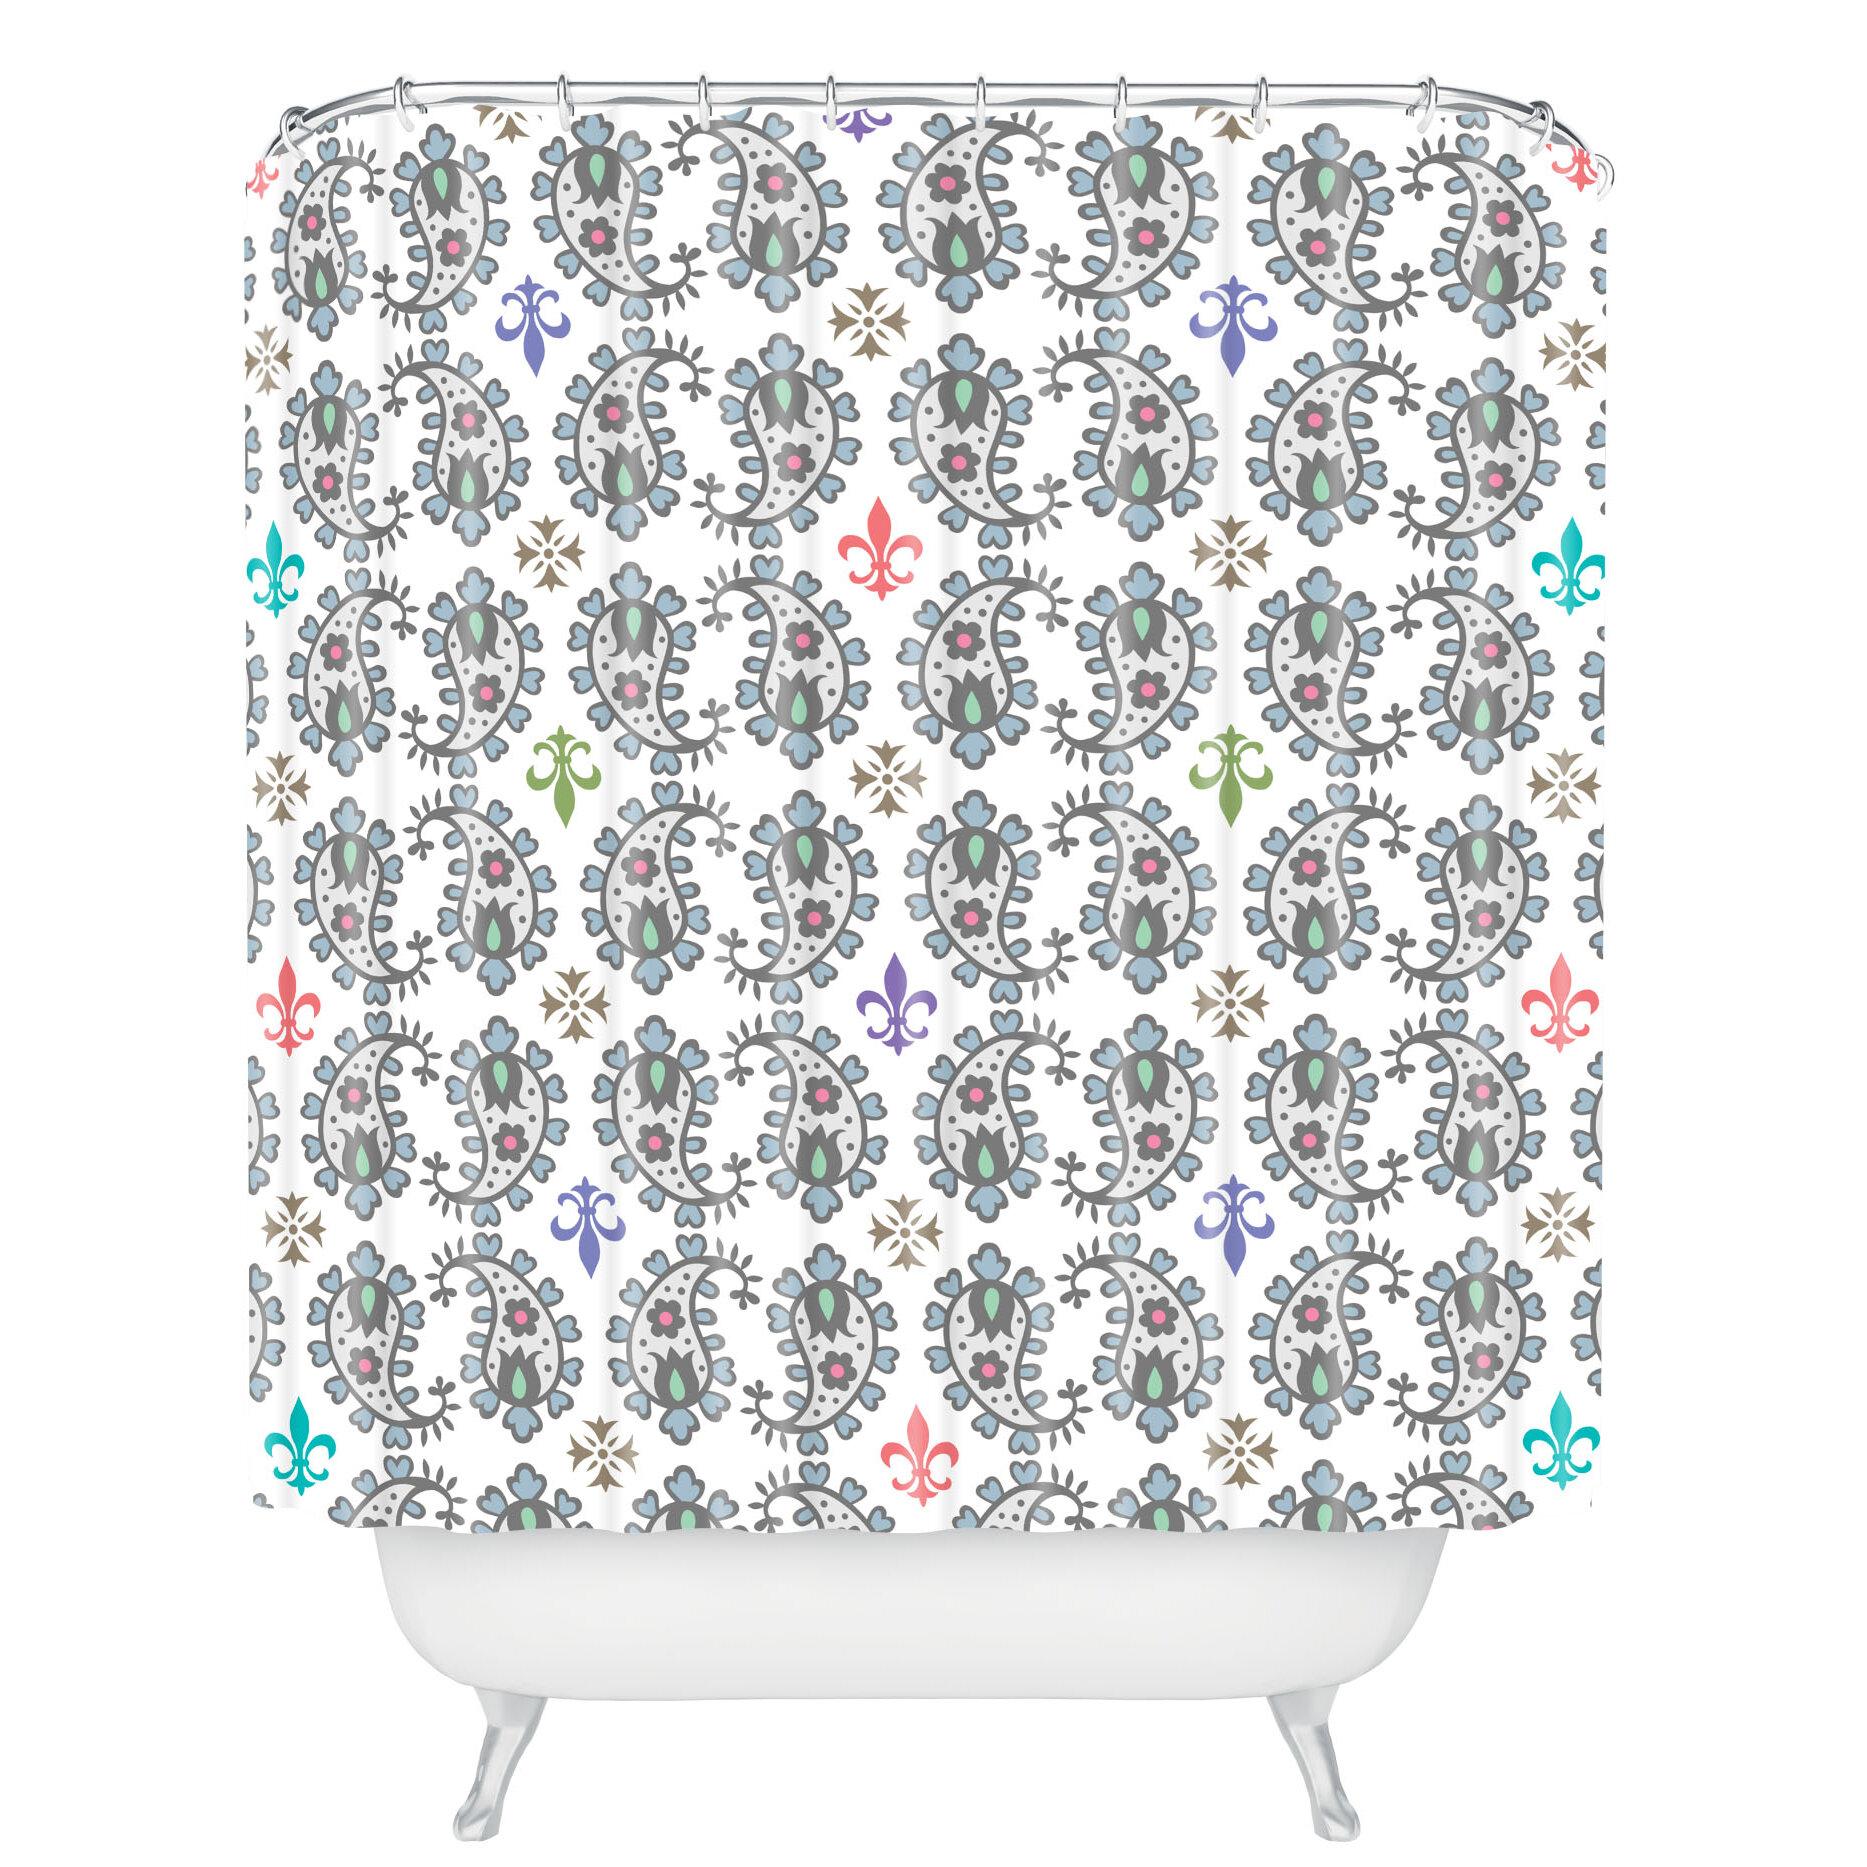 Deny Designs Andi Bird Paisley Ornamental Shower Curtain